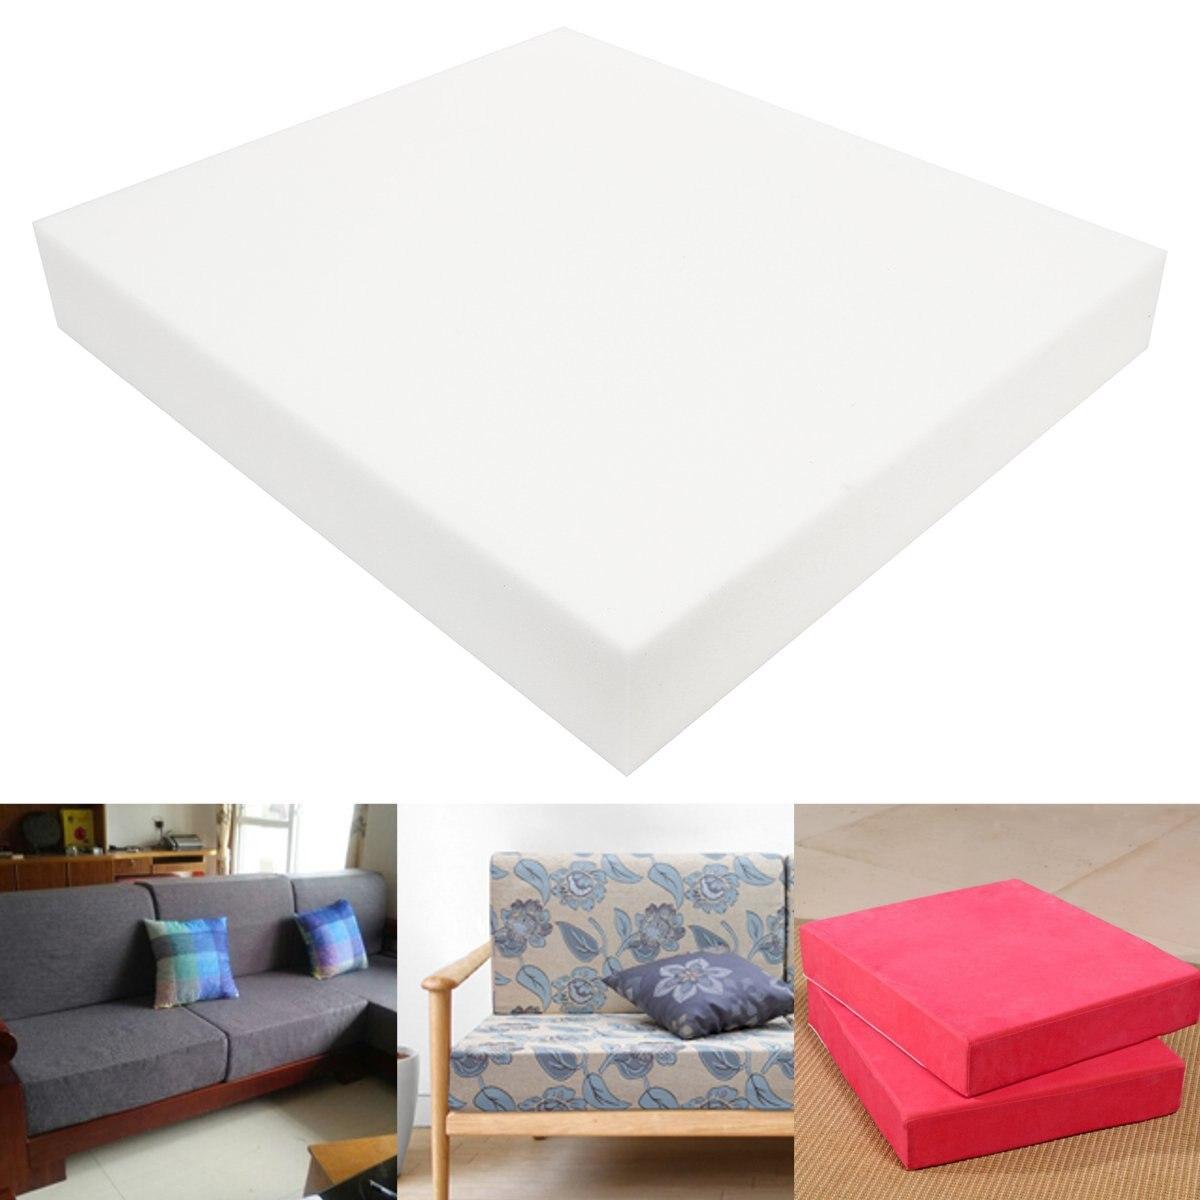 High Density Upholstery Cushion Foam Chair Sofa Seat Foam Pad Sheet Mattress Bed Floor High Density Upholstery Cushion 55X55cm